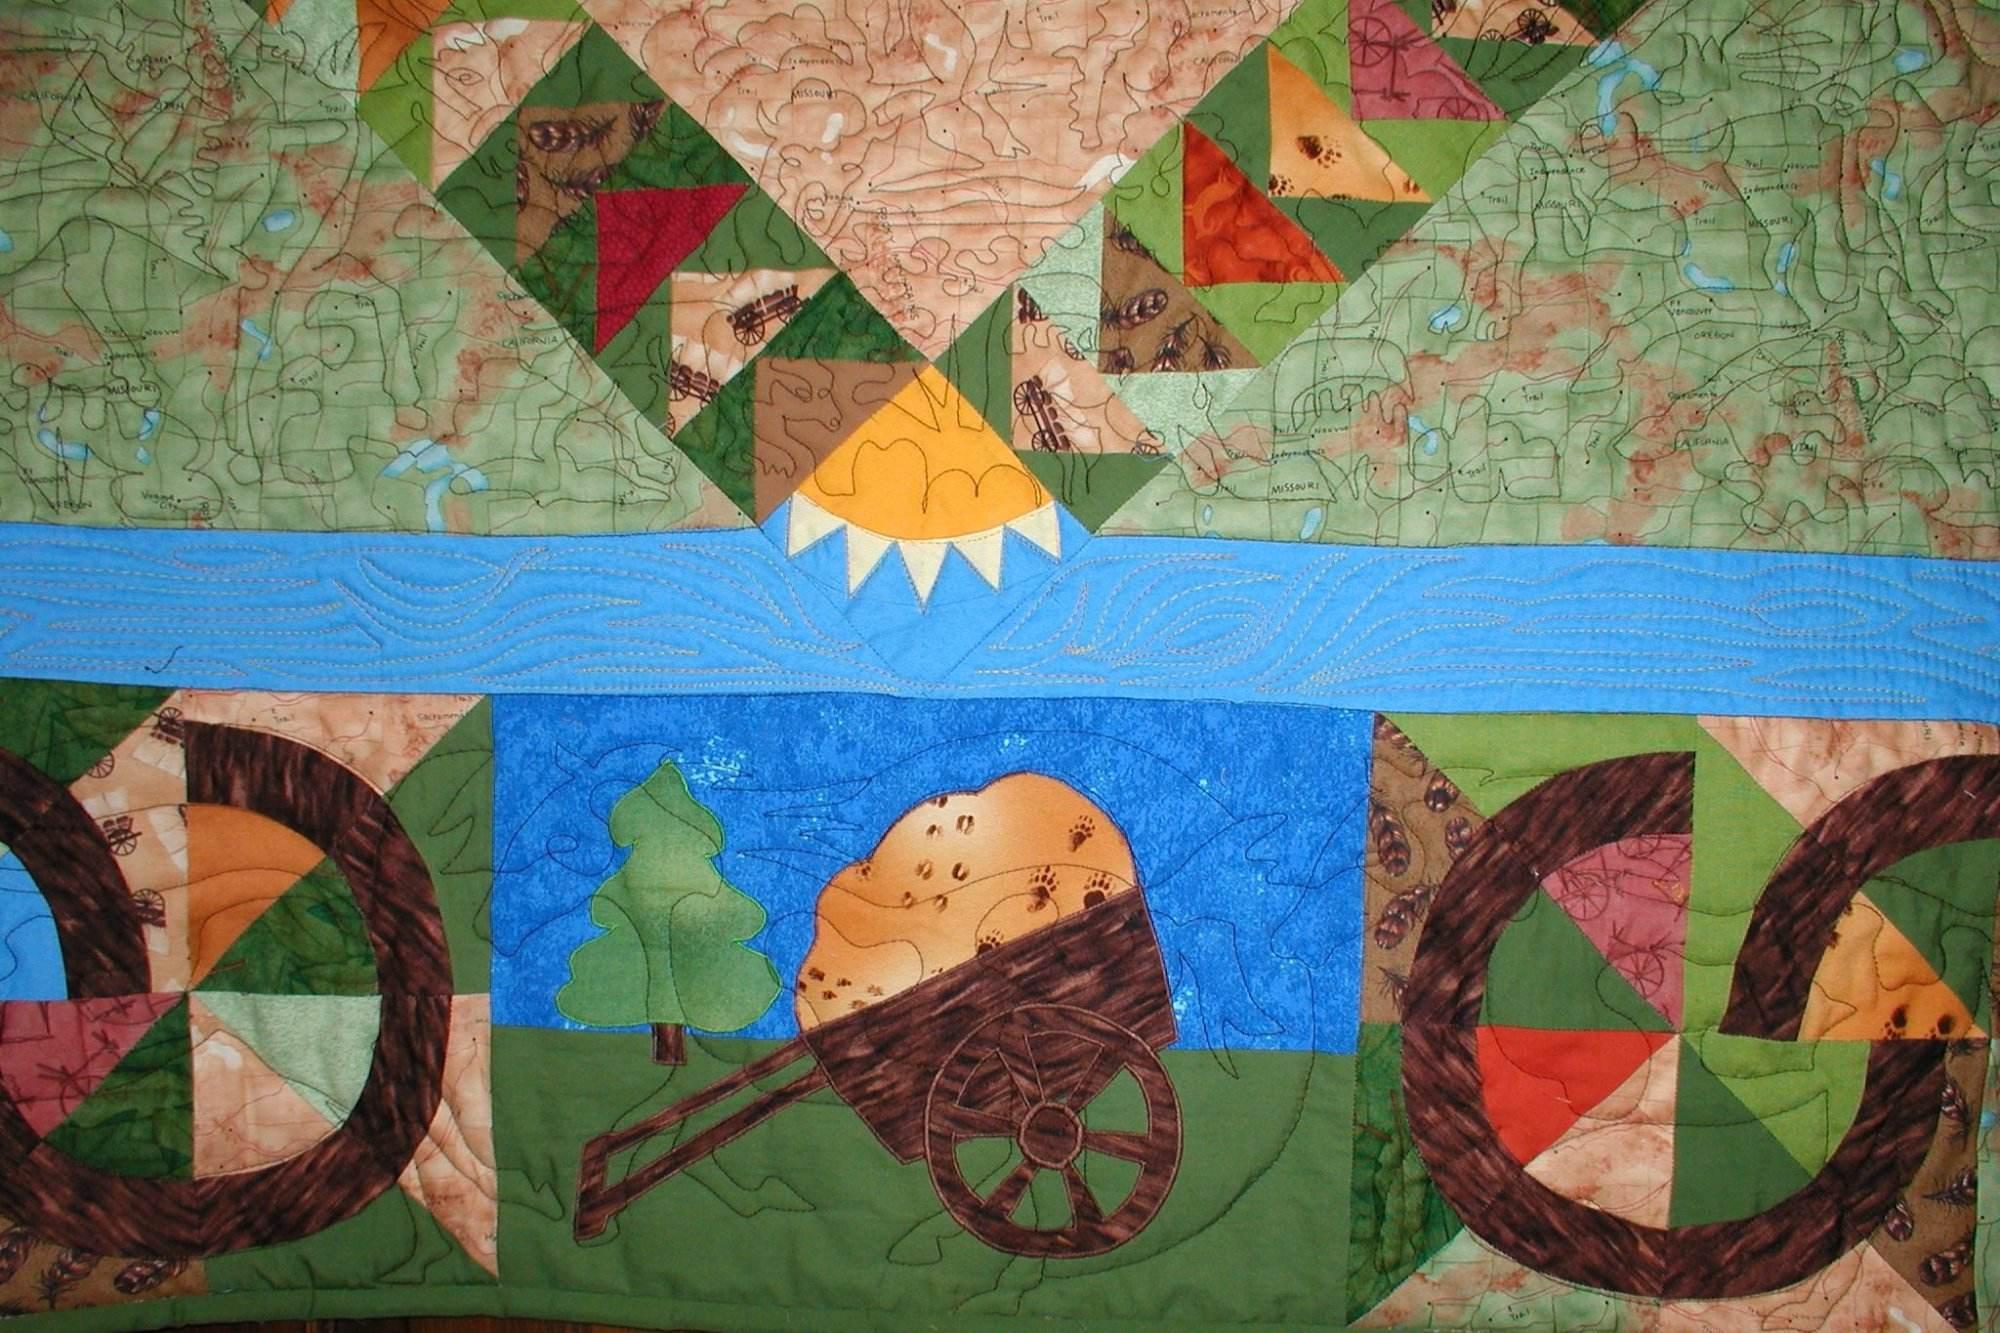 Westward Ho border showing mustang stitching